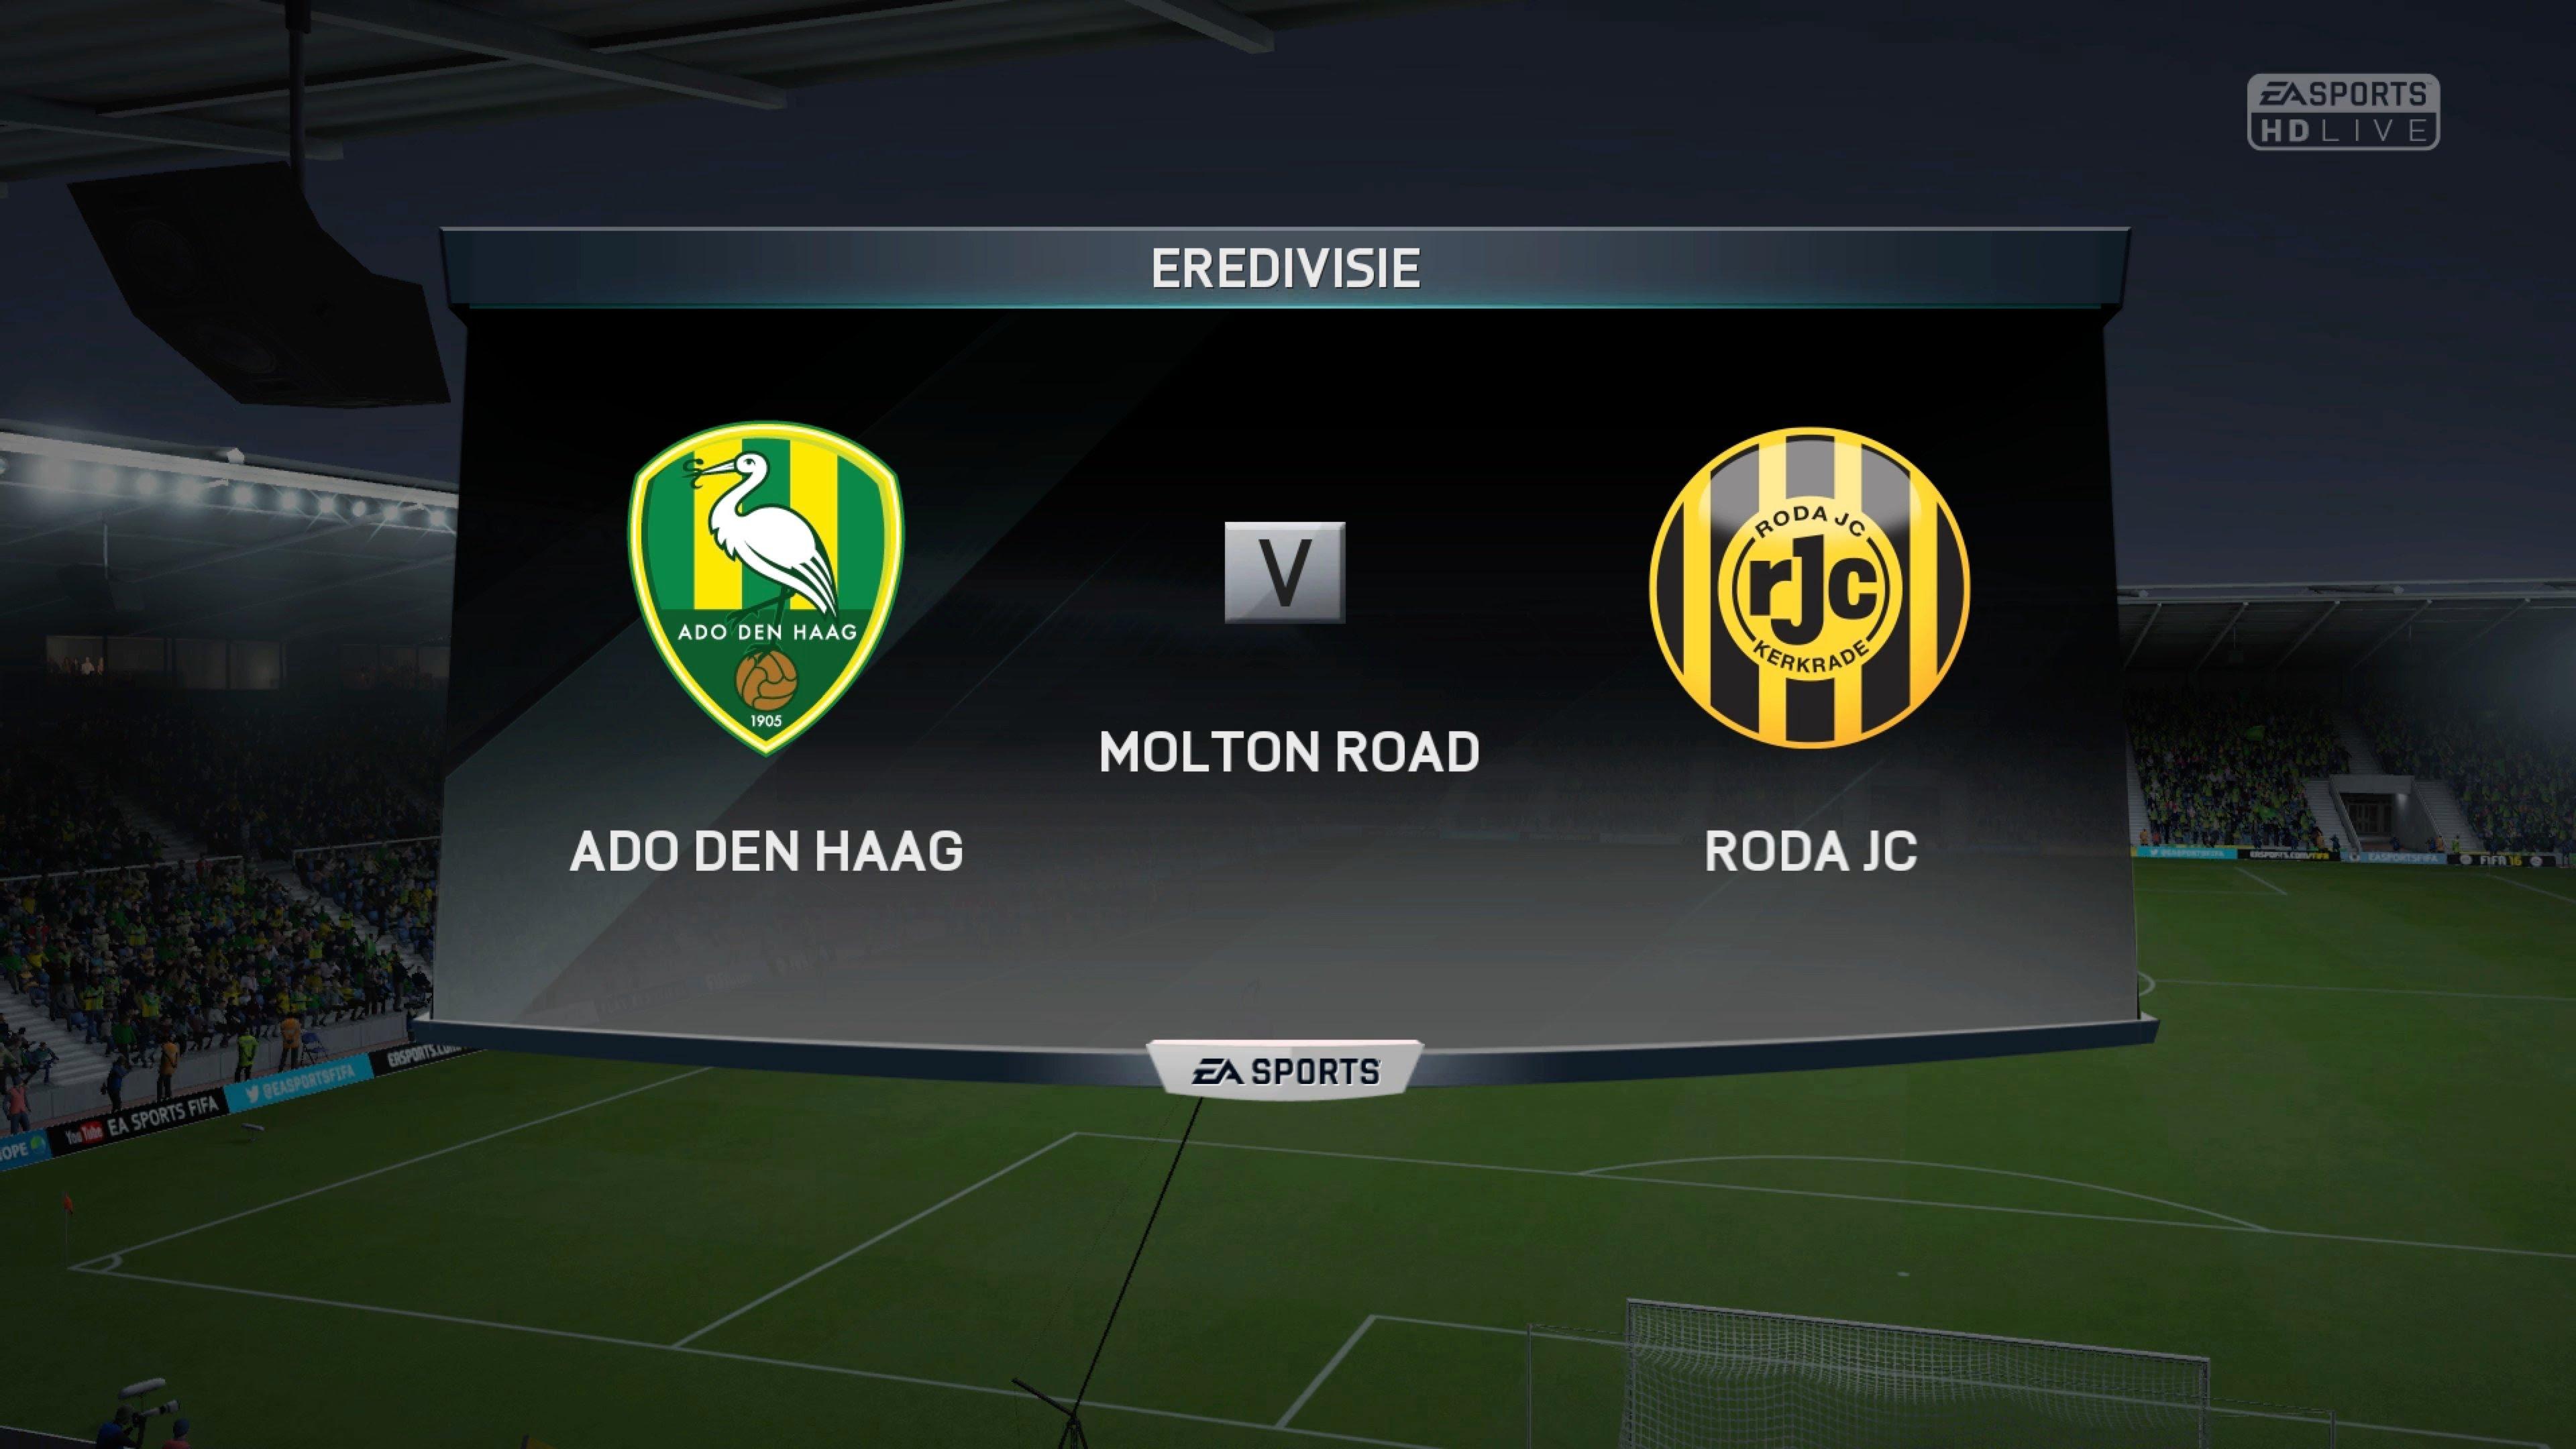 Prediksi Skor ADO Den Haag vs Roda JC 14 Desember 2017